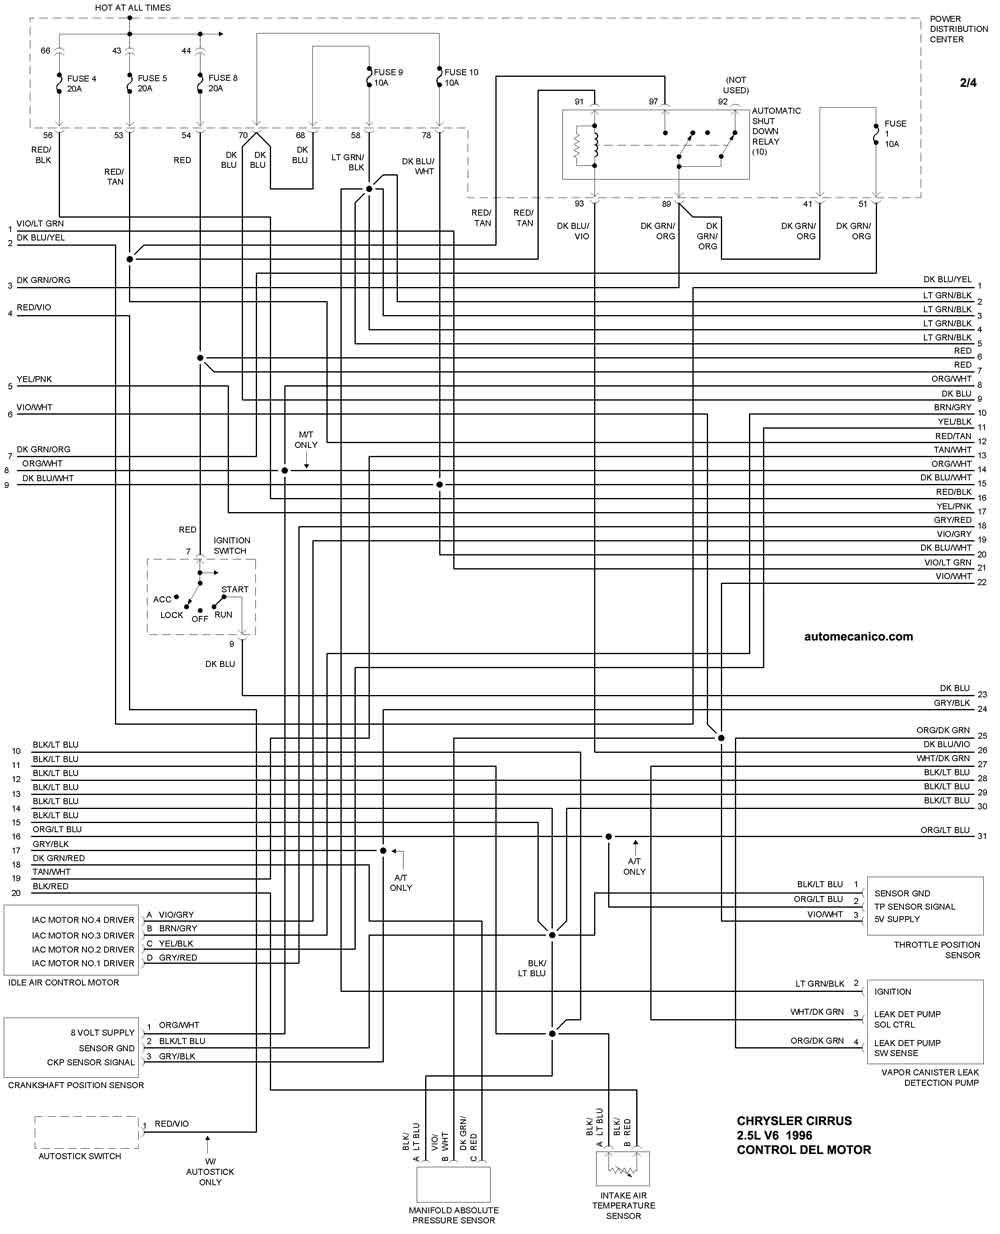 2015 chrysler 300c owners manual pdf